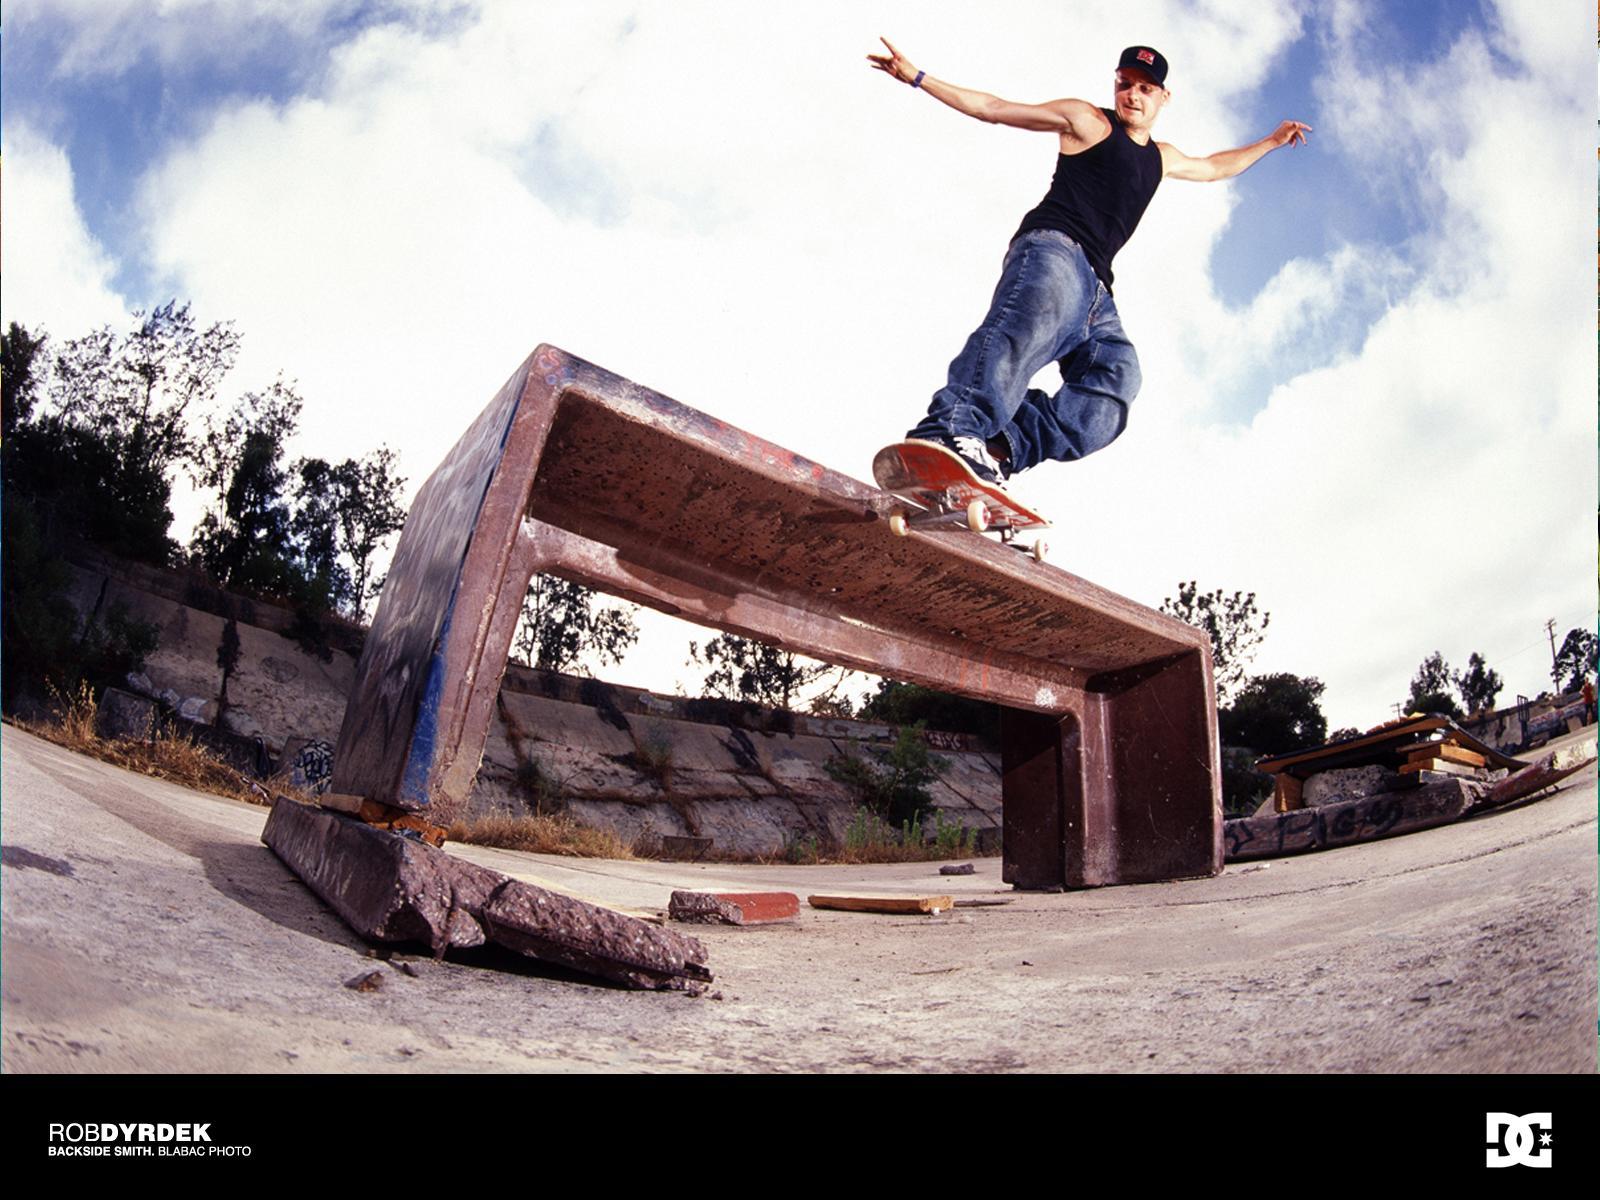 Rob Dyrdek Skateboarding